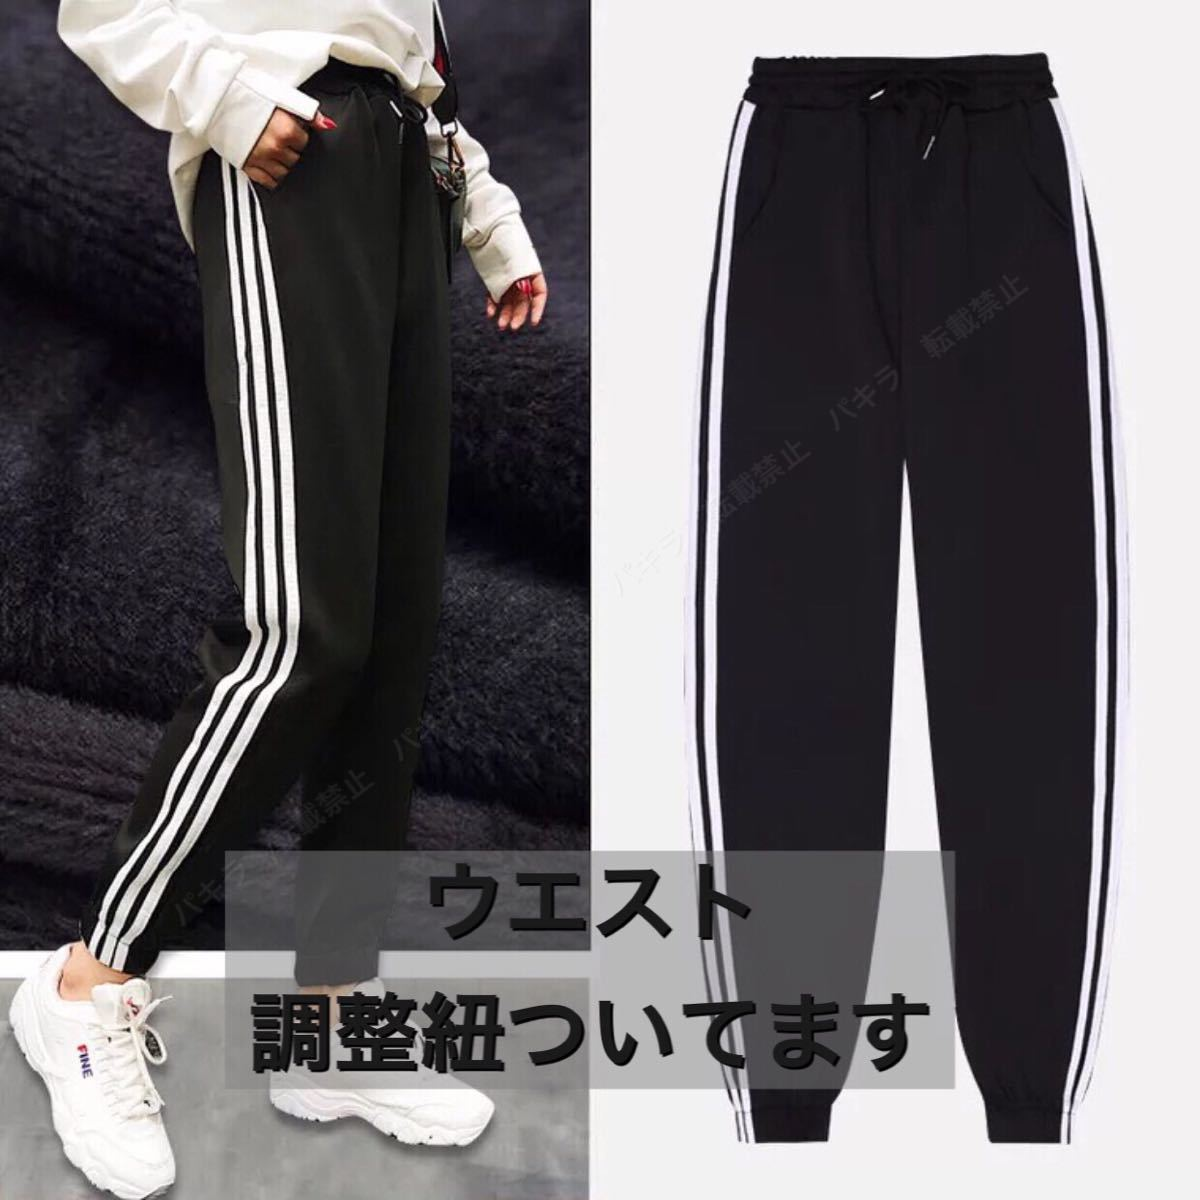 S ジョガーパンツ ジャージ スキニー サイドラインパンツ 男女兼用 スウェット